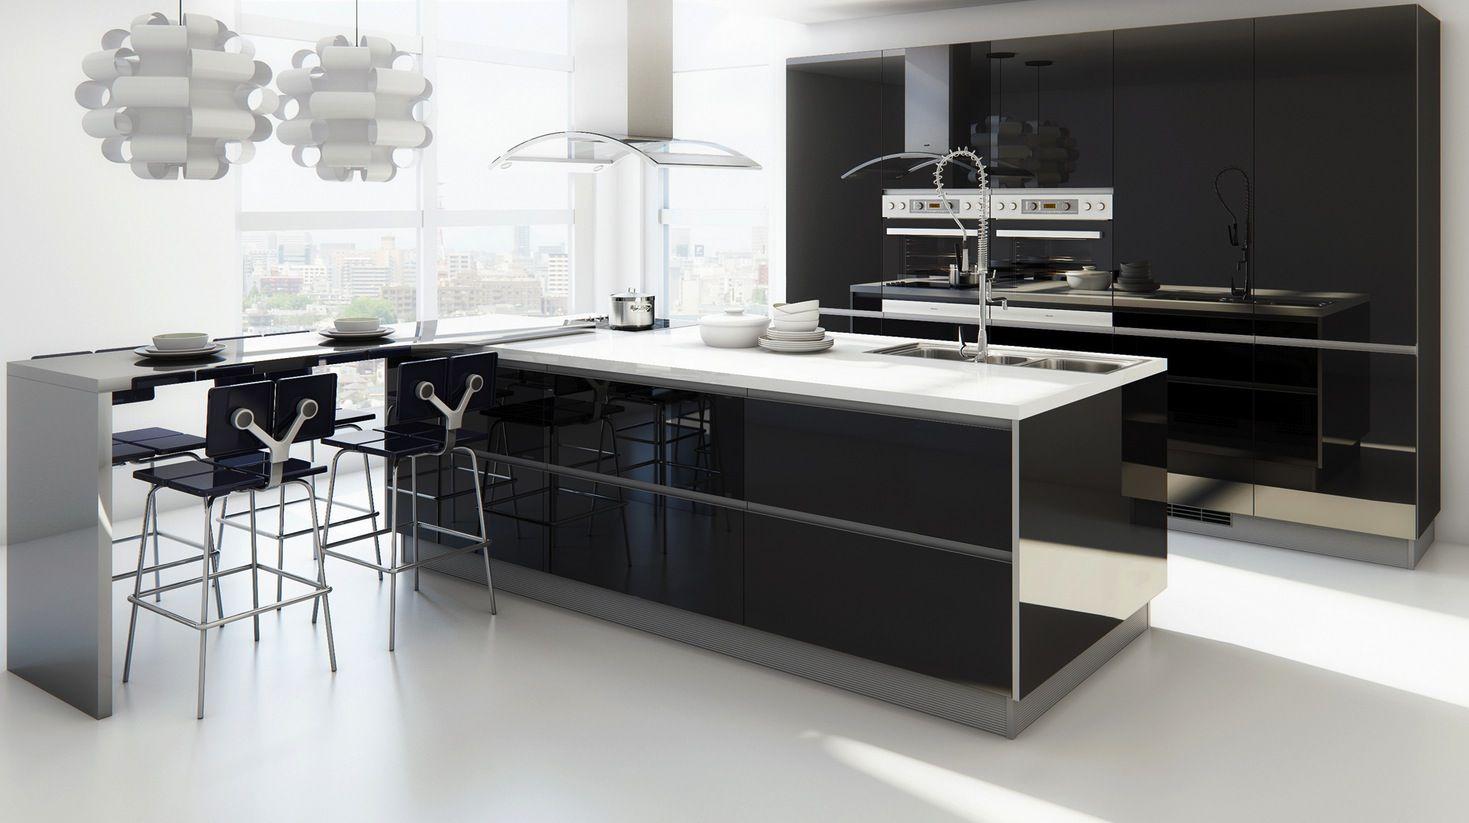 Schön Celestial Beauty Of Modern Kitchen